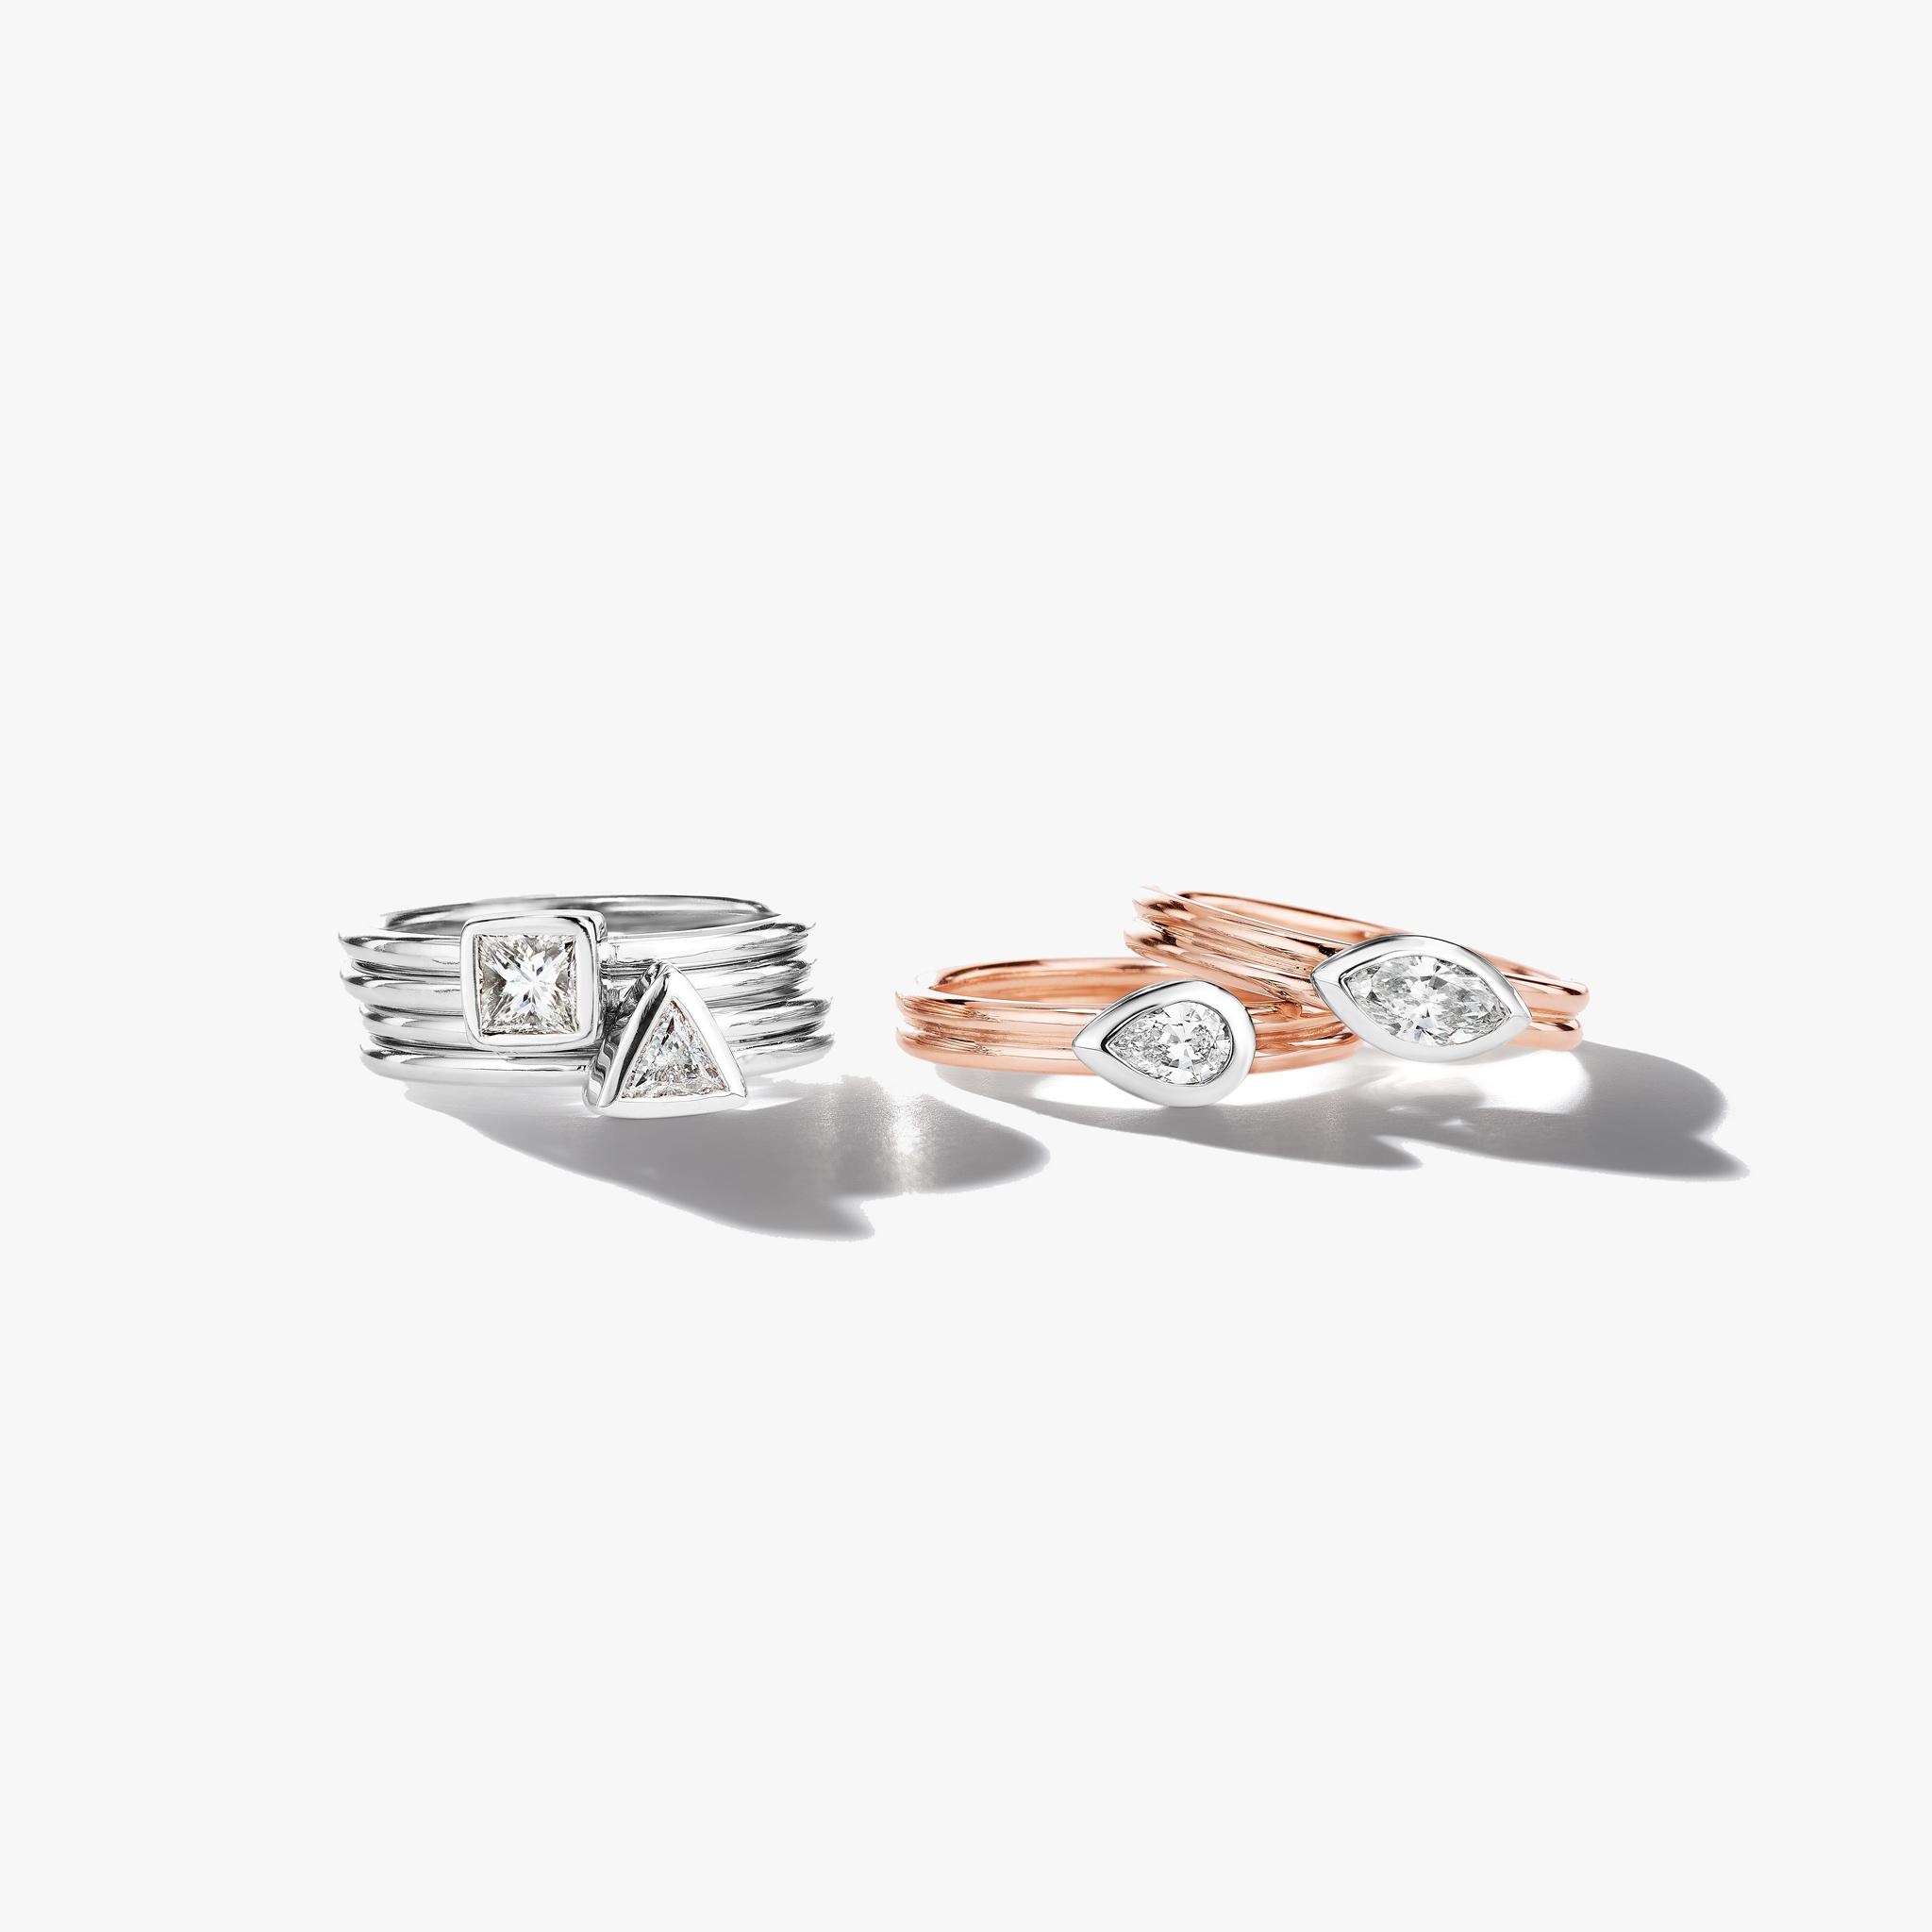 Marquise-Cut-Bezel-Set-Diamond-Ring_18k Rose Gold